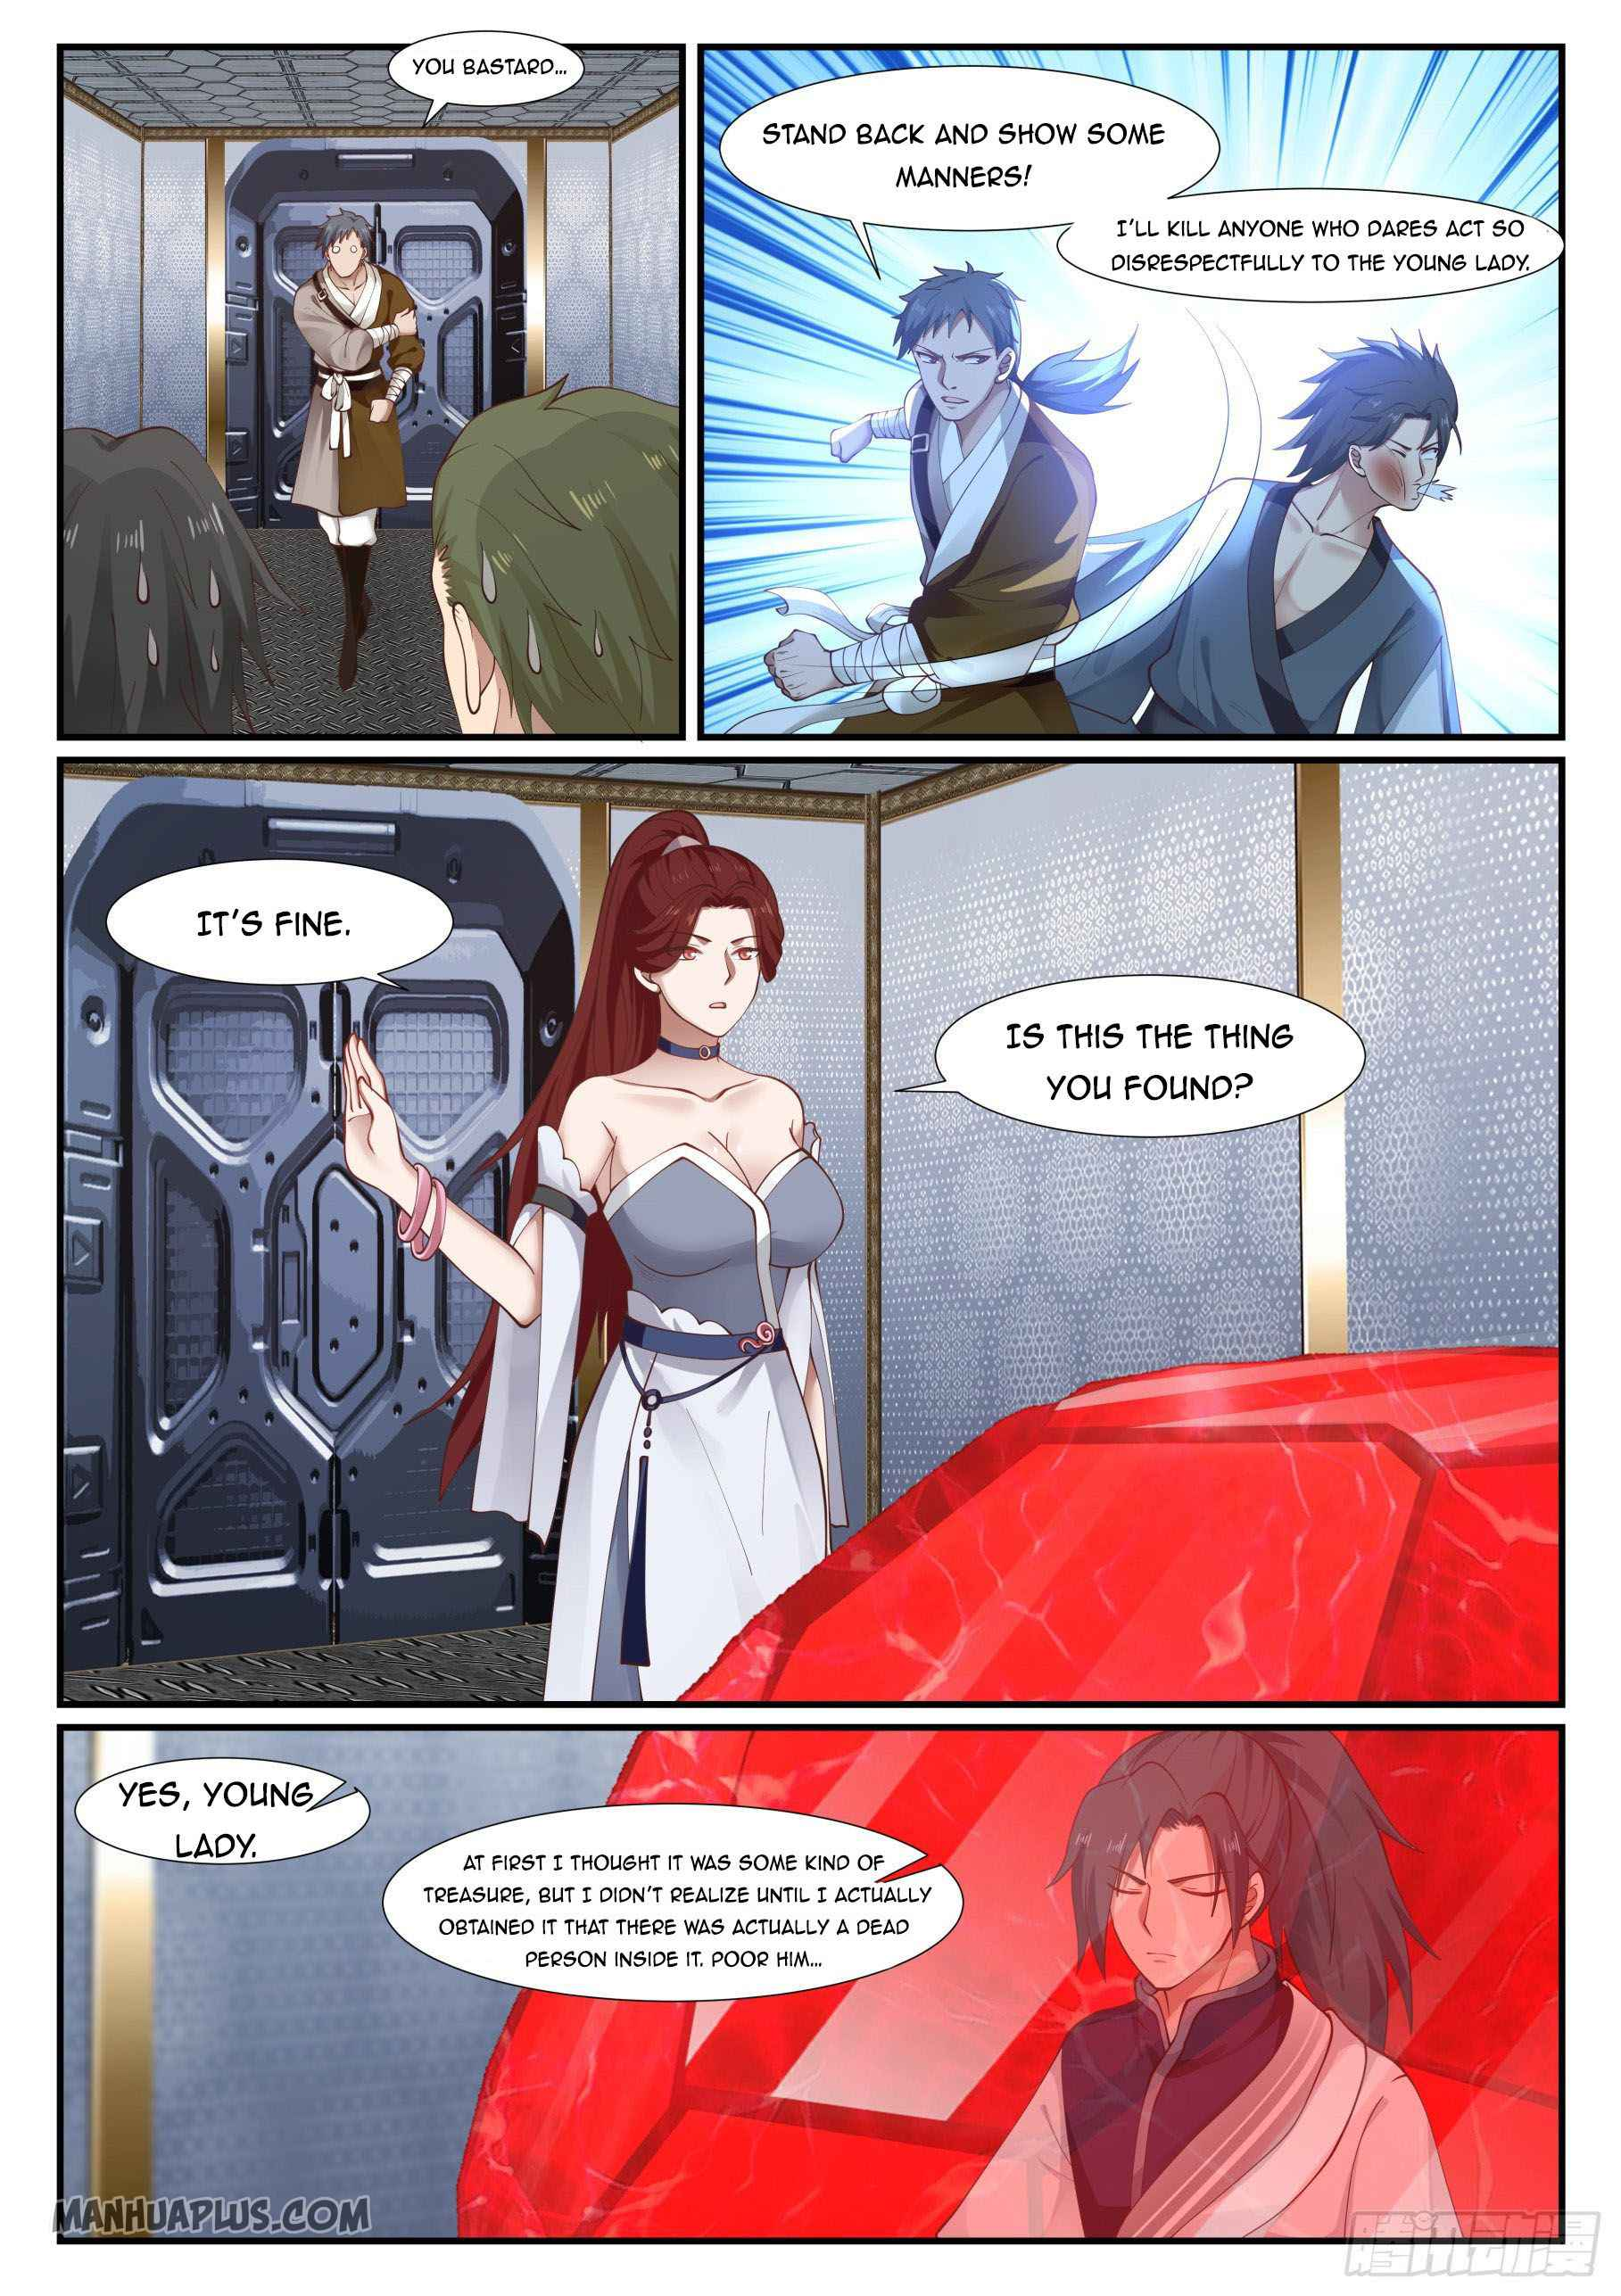 Martial Peak - chapter 979-eng-li